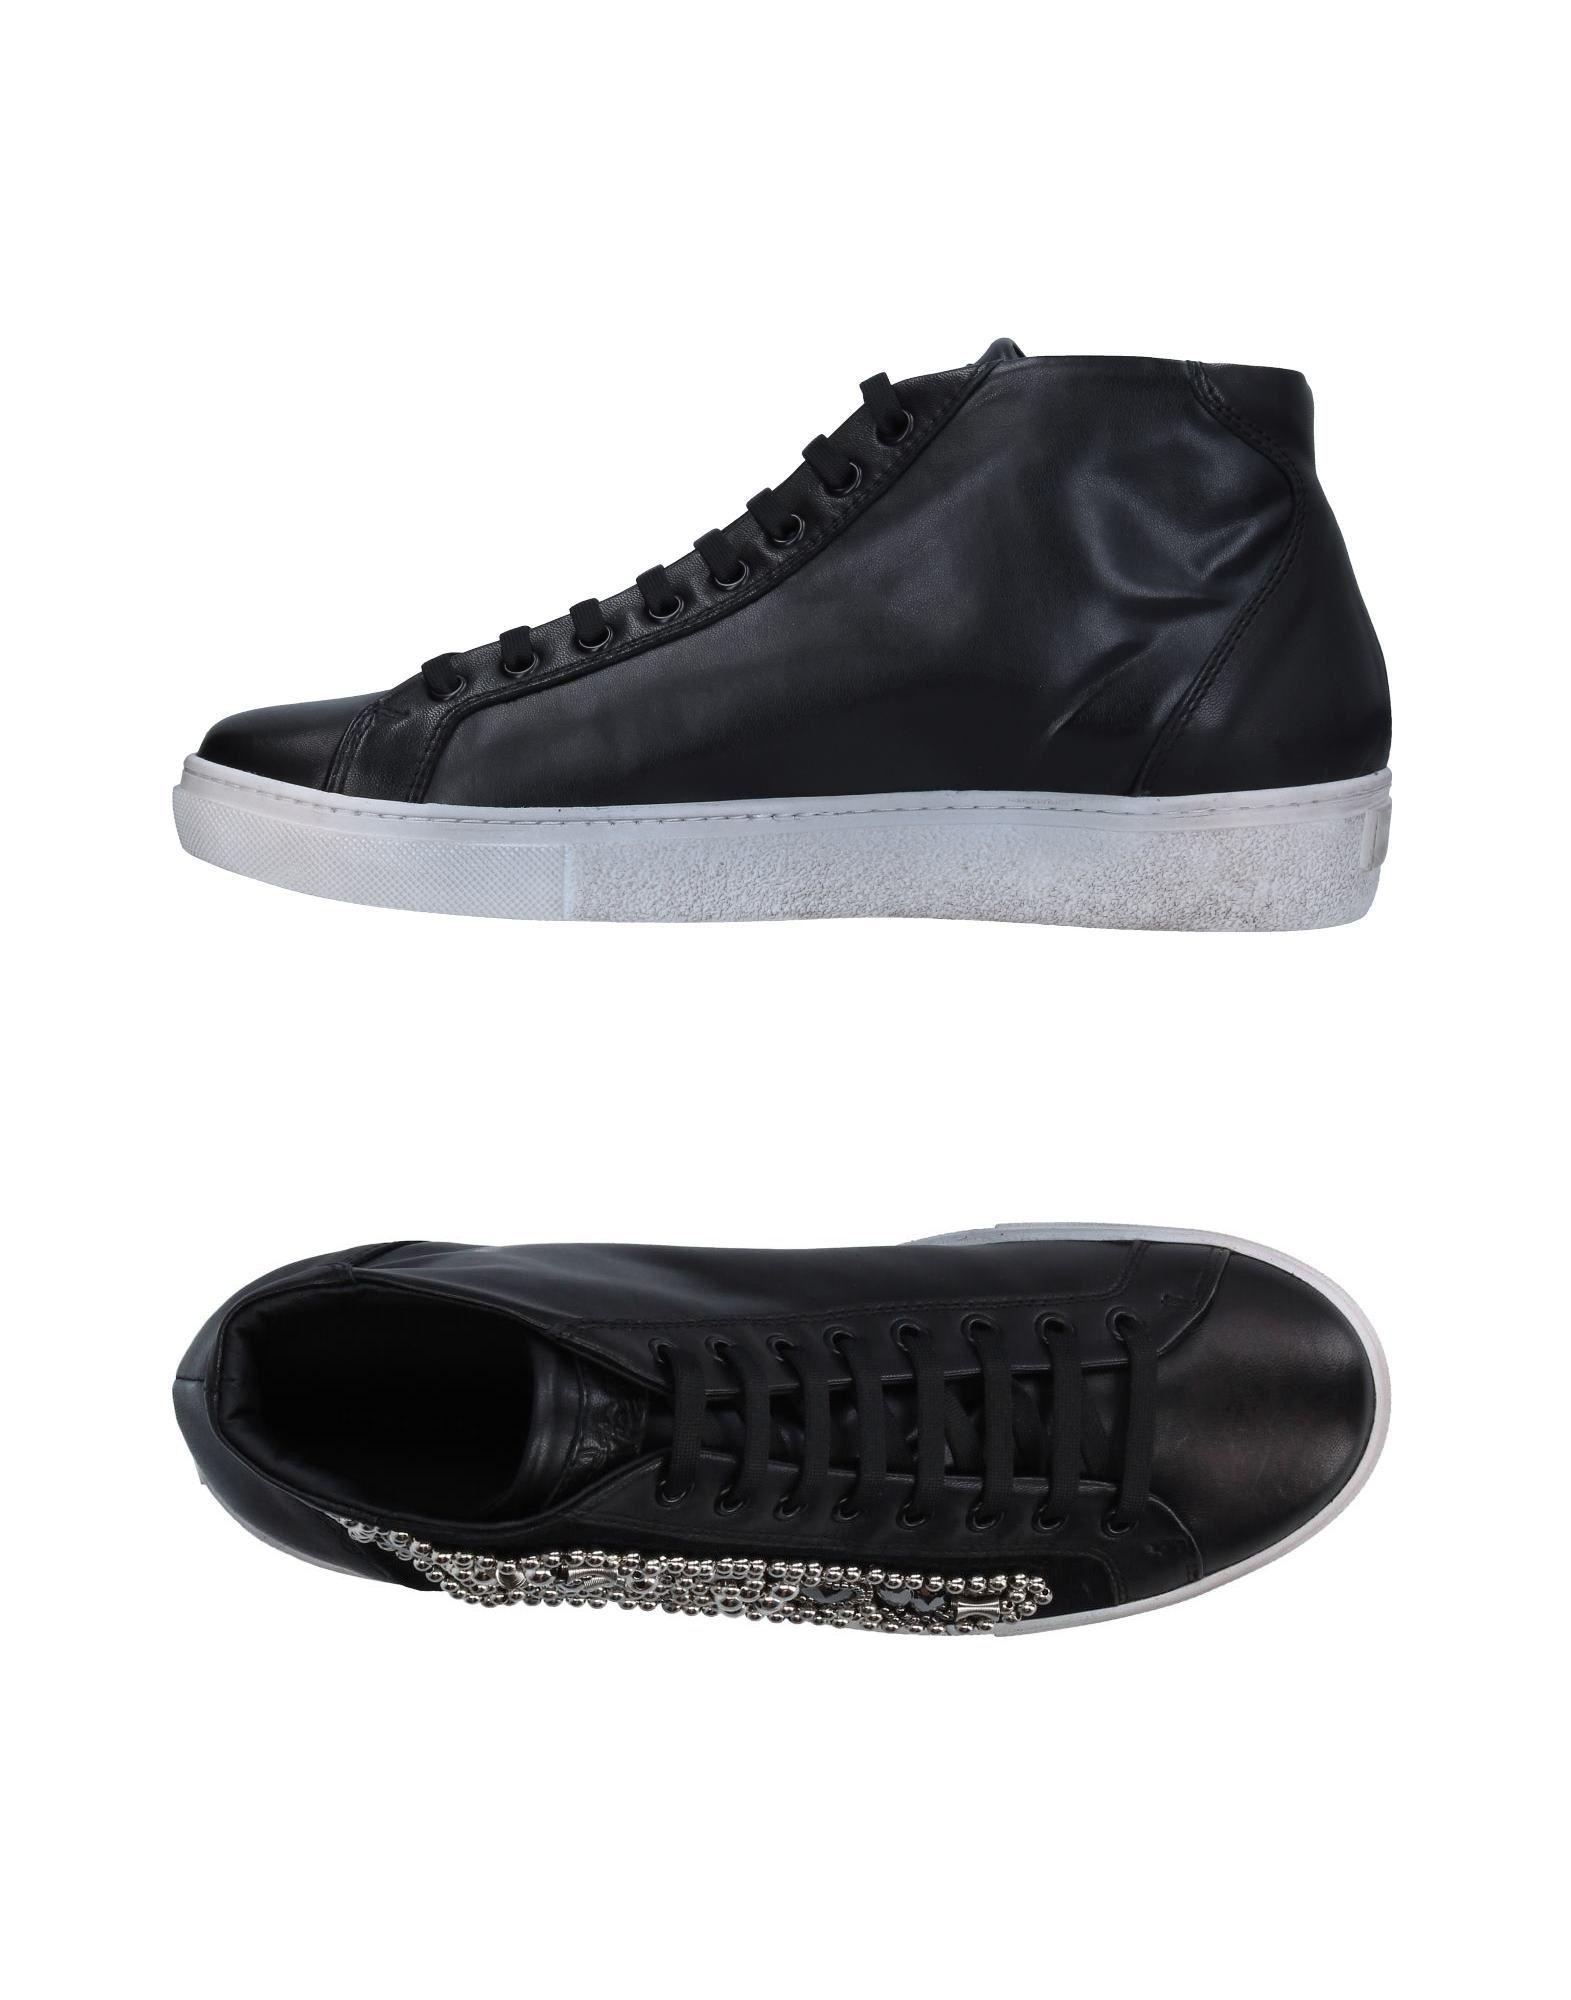 Tosca Blu Shoes Sneakers Damen  11309795JO Gute Qualität beliebte Schuhe